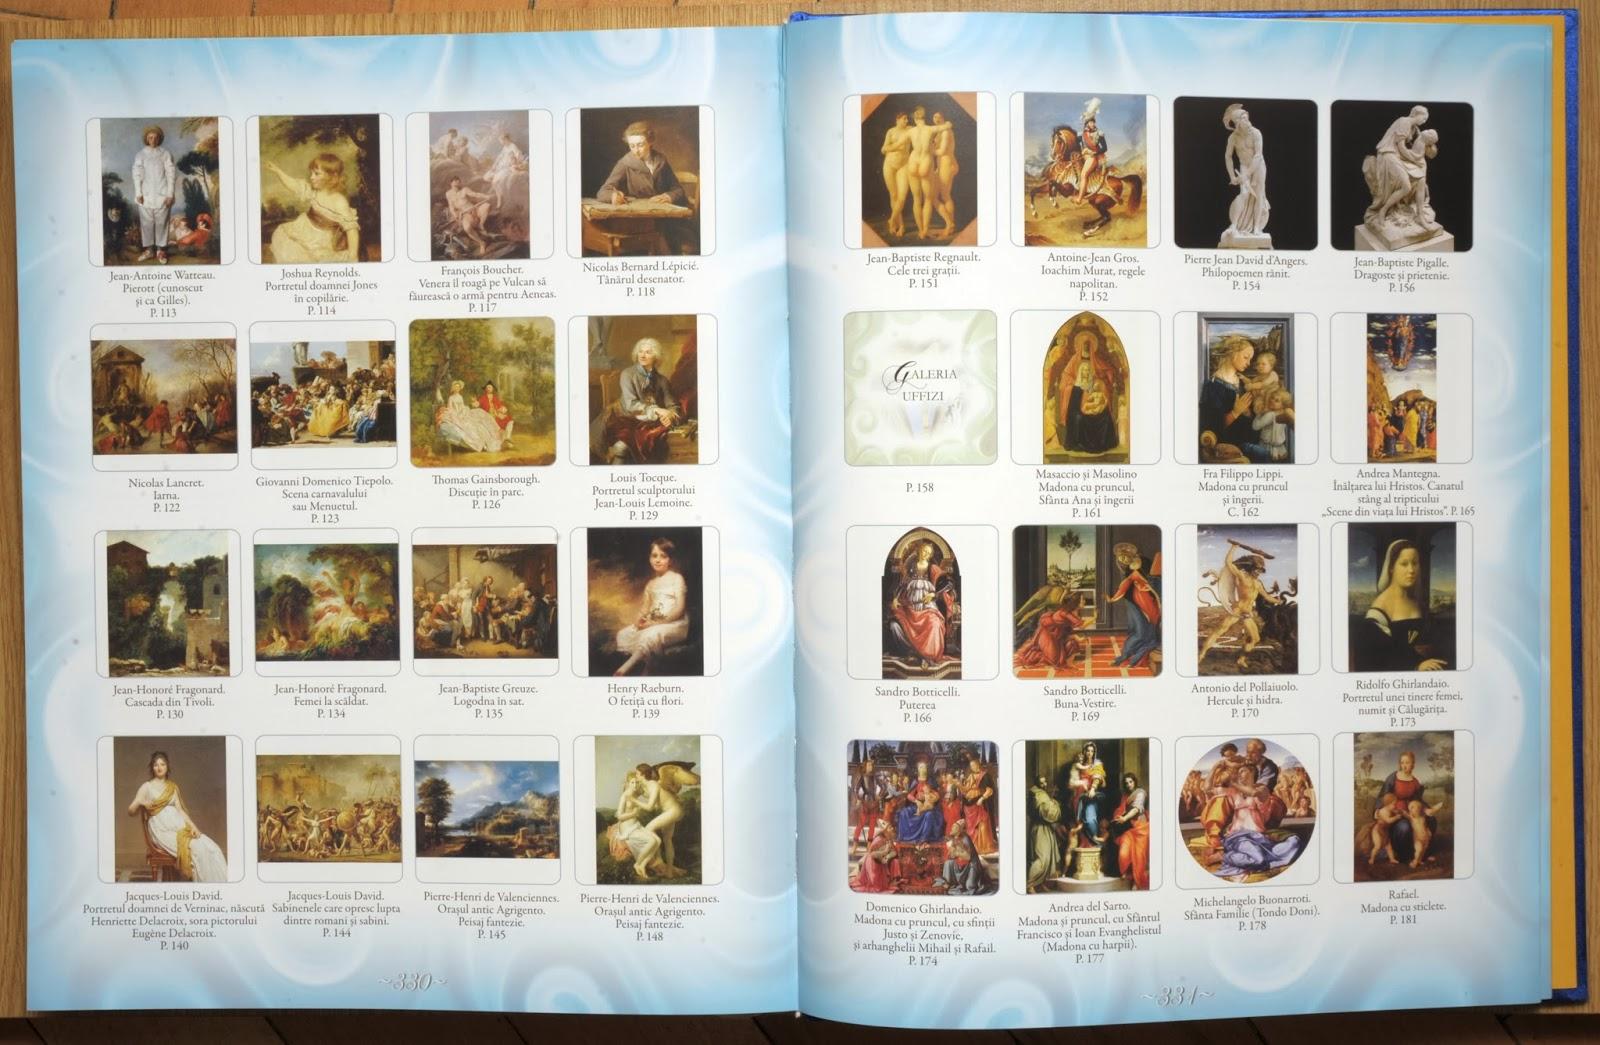 Galeria Uffizi - Sandro Botticelli